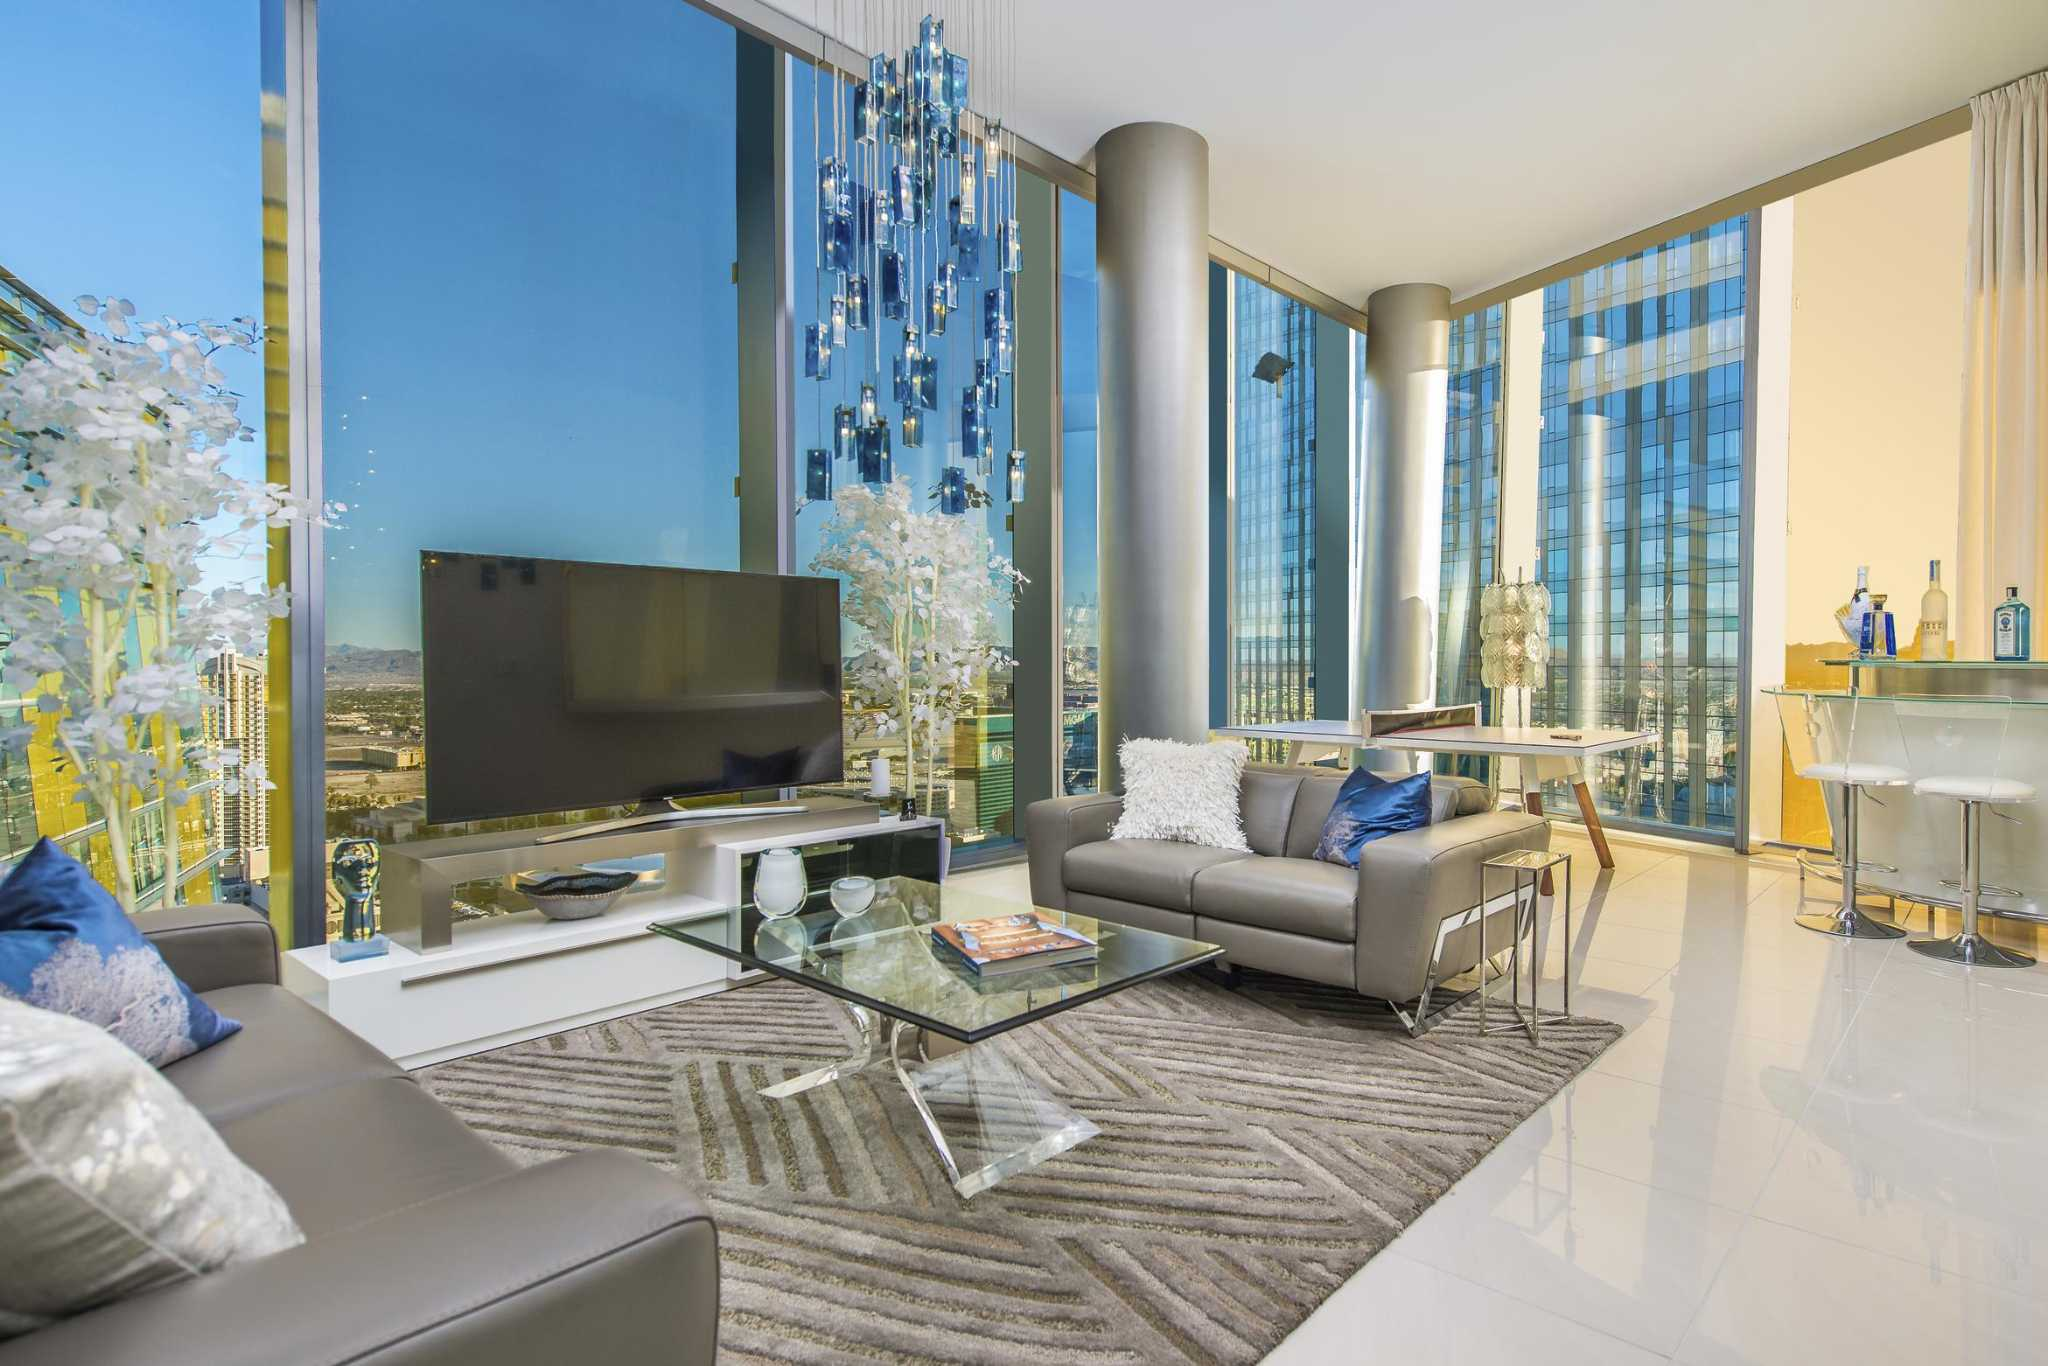 Getaway: Floor-to-ceiling luxury awaits in 36th floor penthouse ...